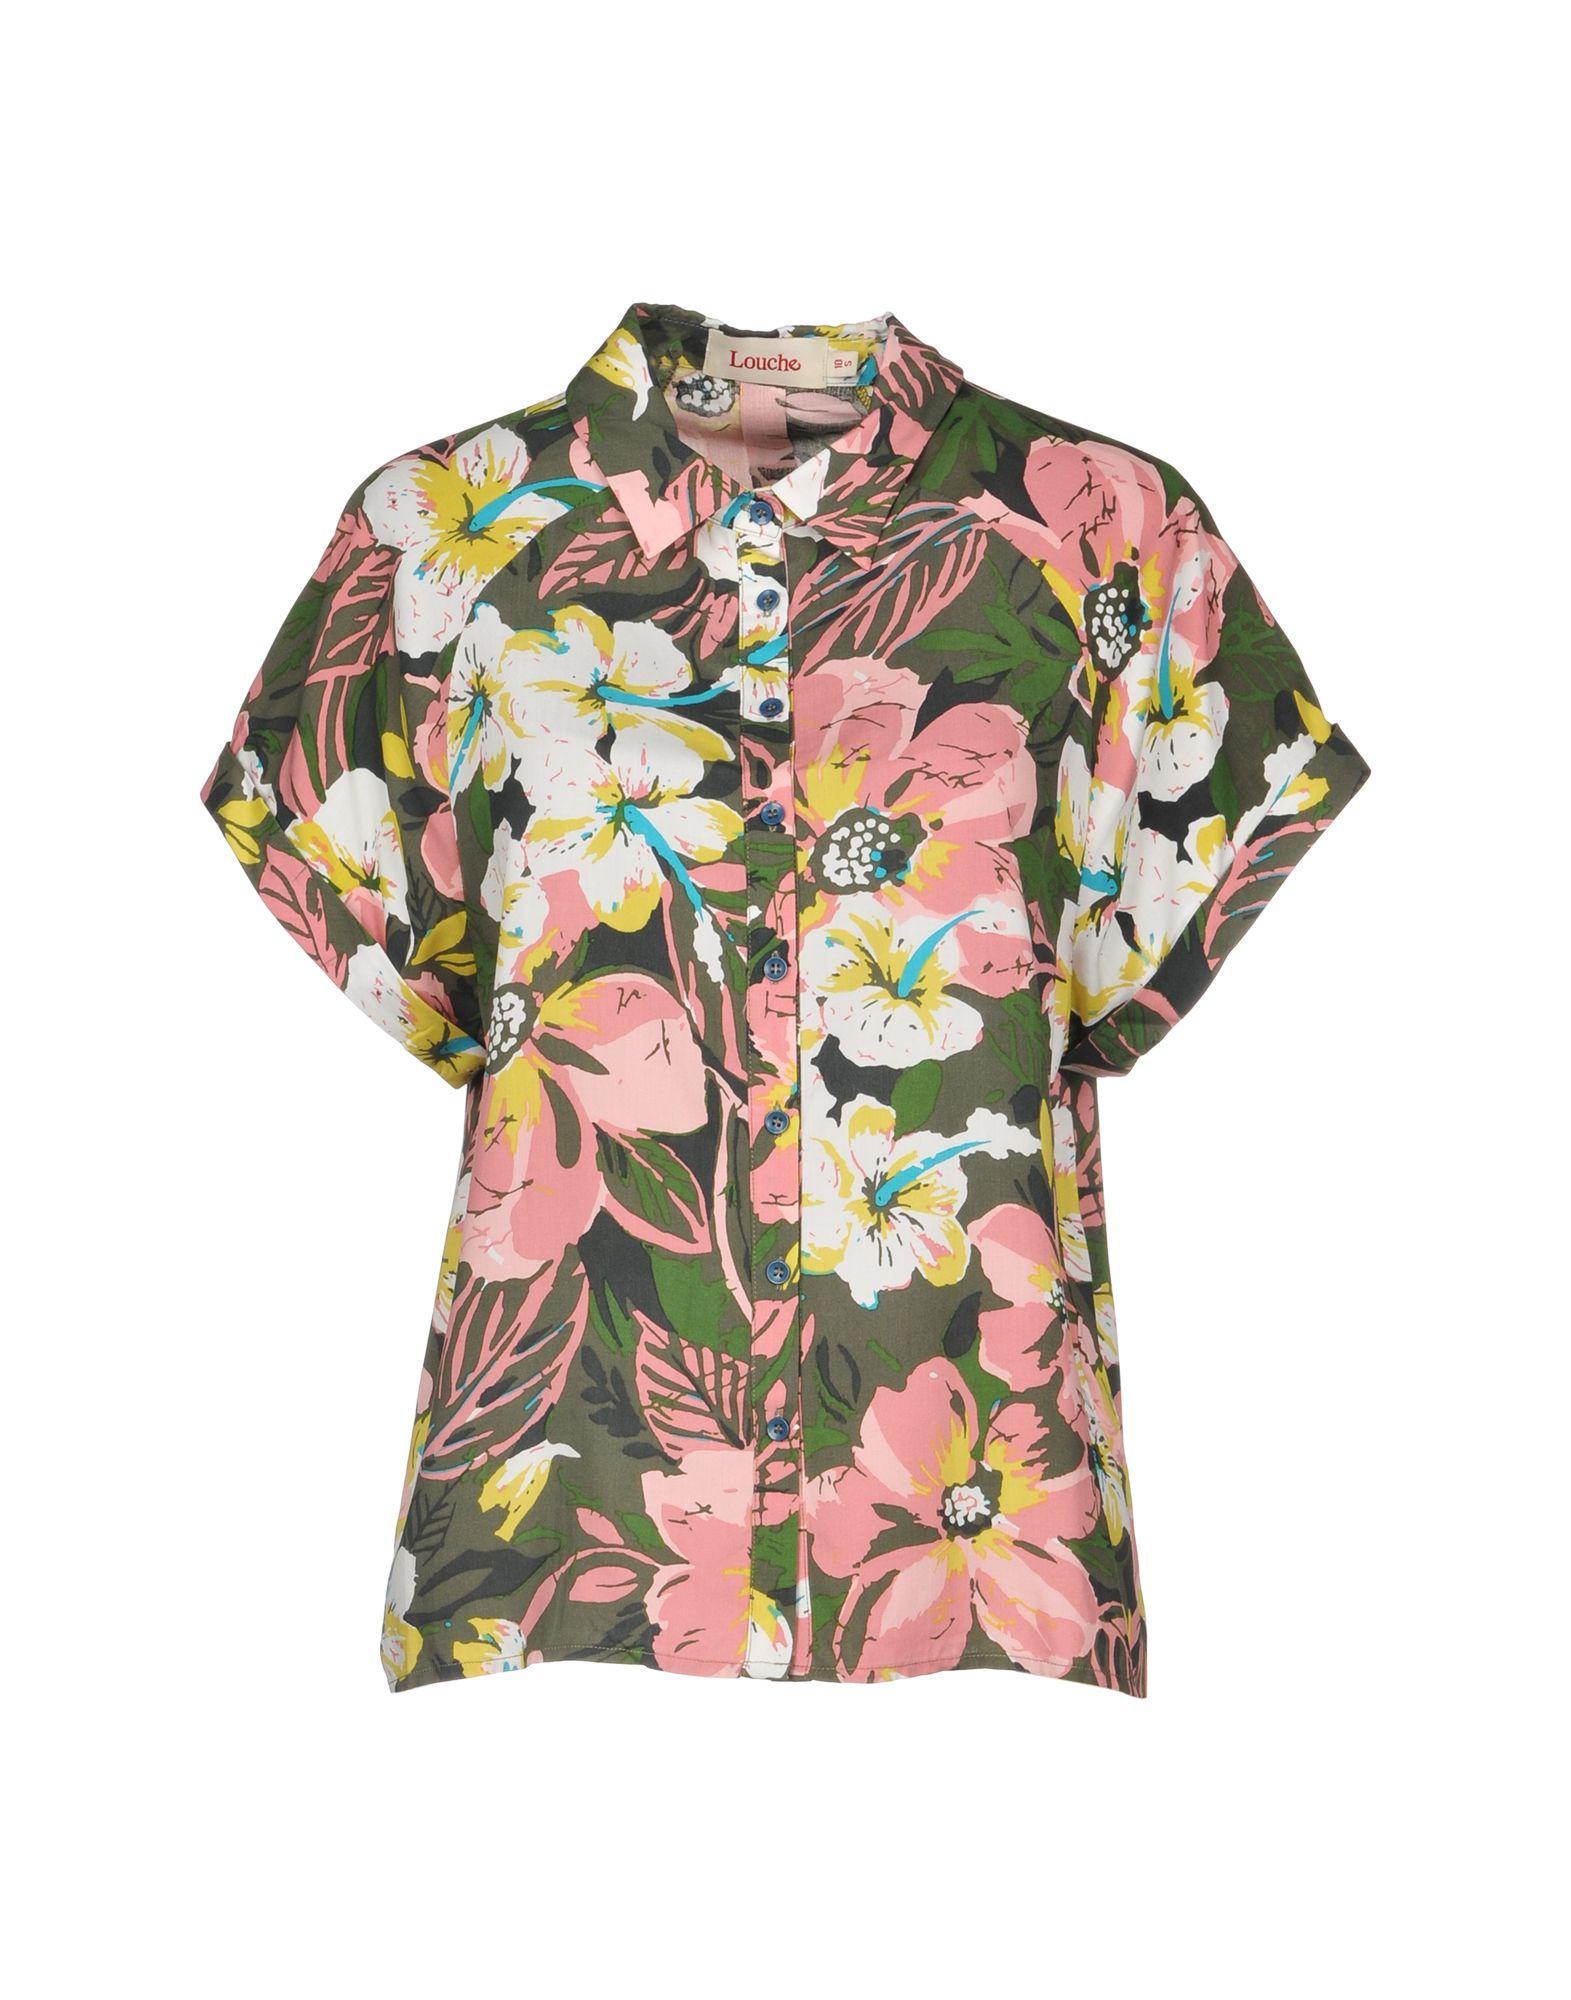 Camicie E bluse A Fiori Louche donna donna - 38758115EL  Auswahl mit niedrigem Preis